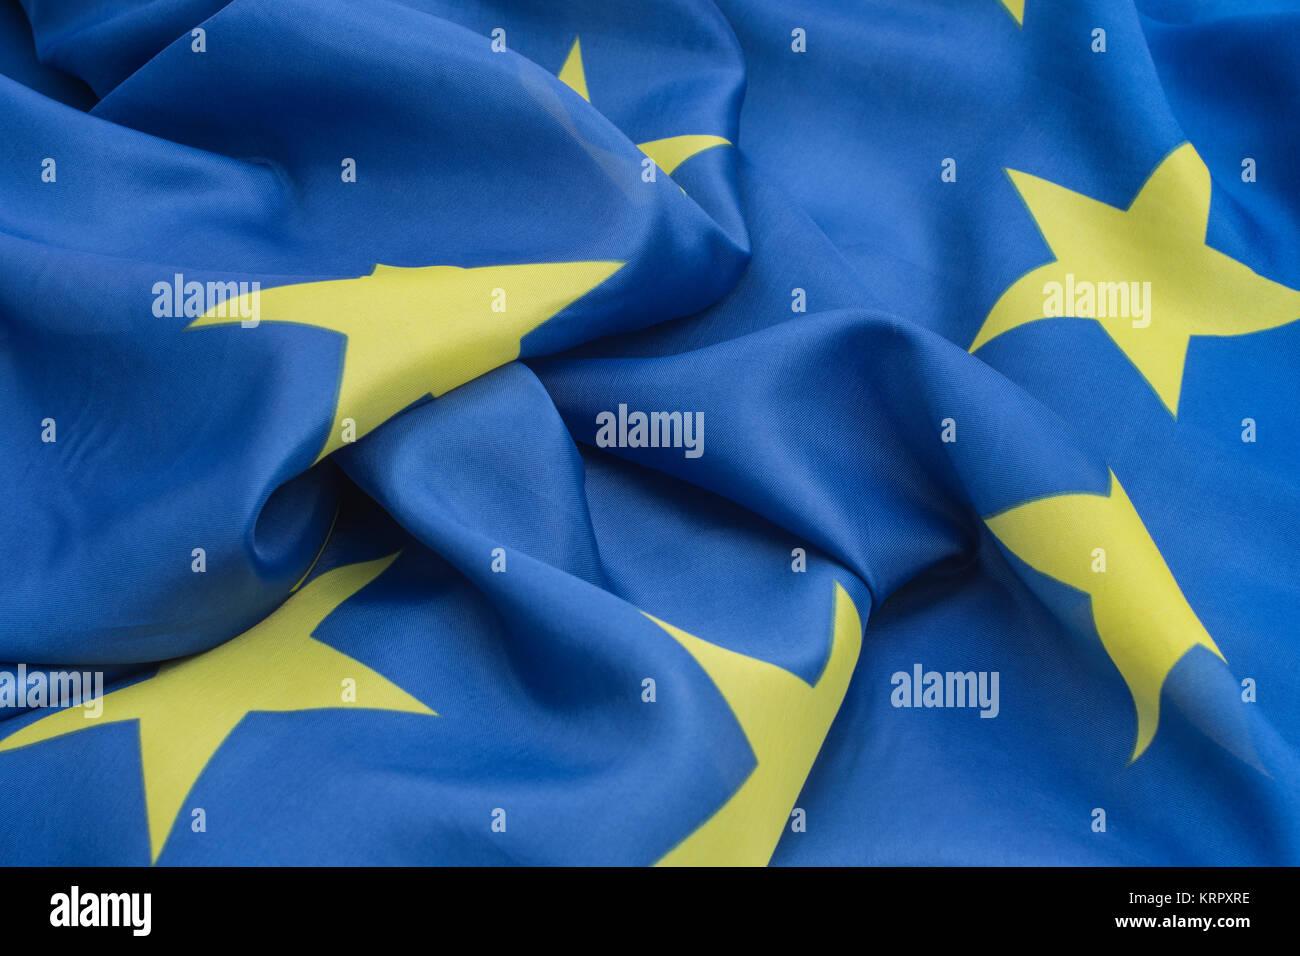 Large, ruffled EU flag - metaphor for EU disunity or discord. - Stock Image